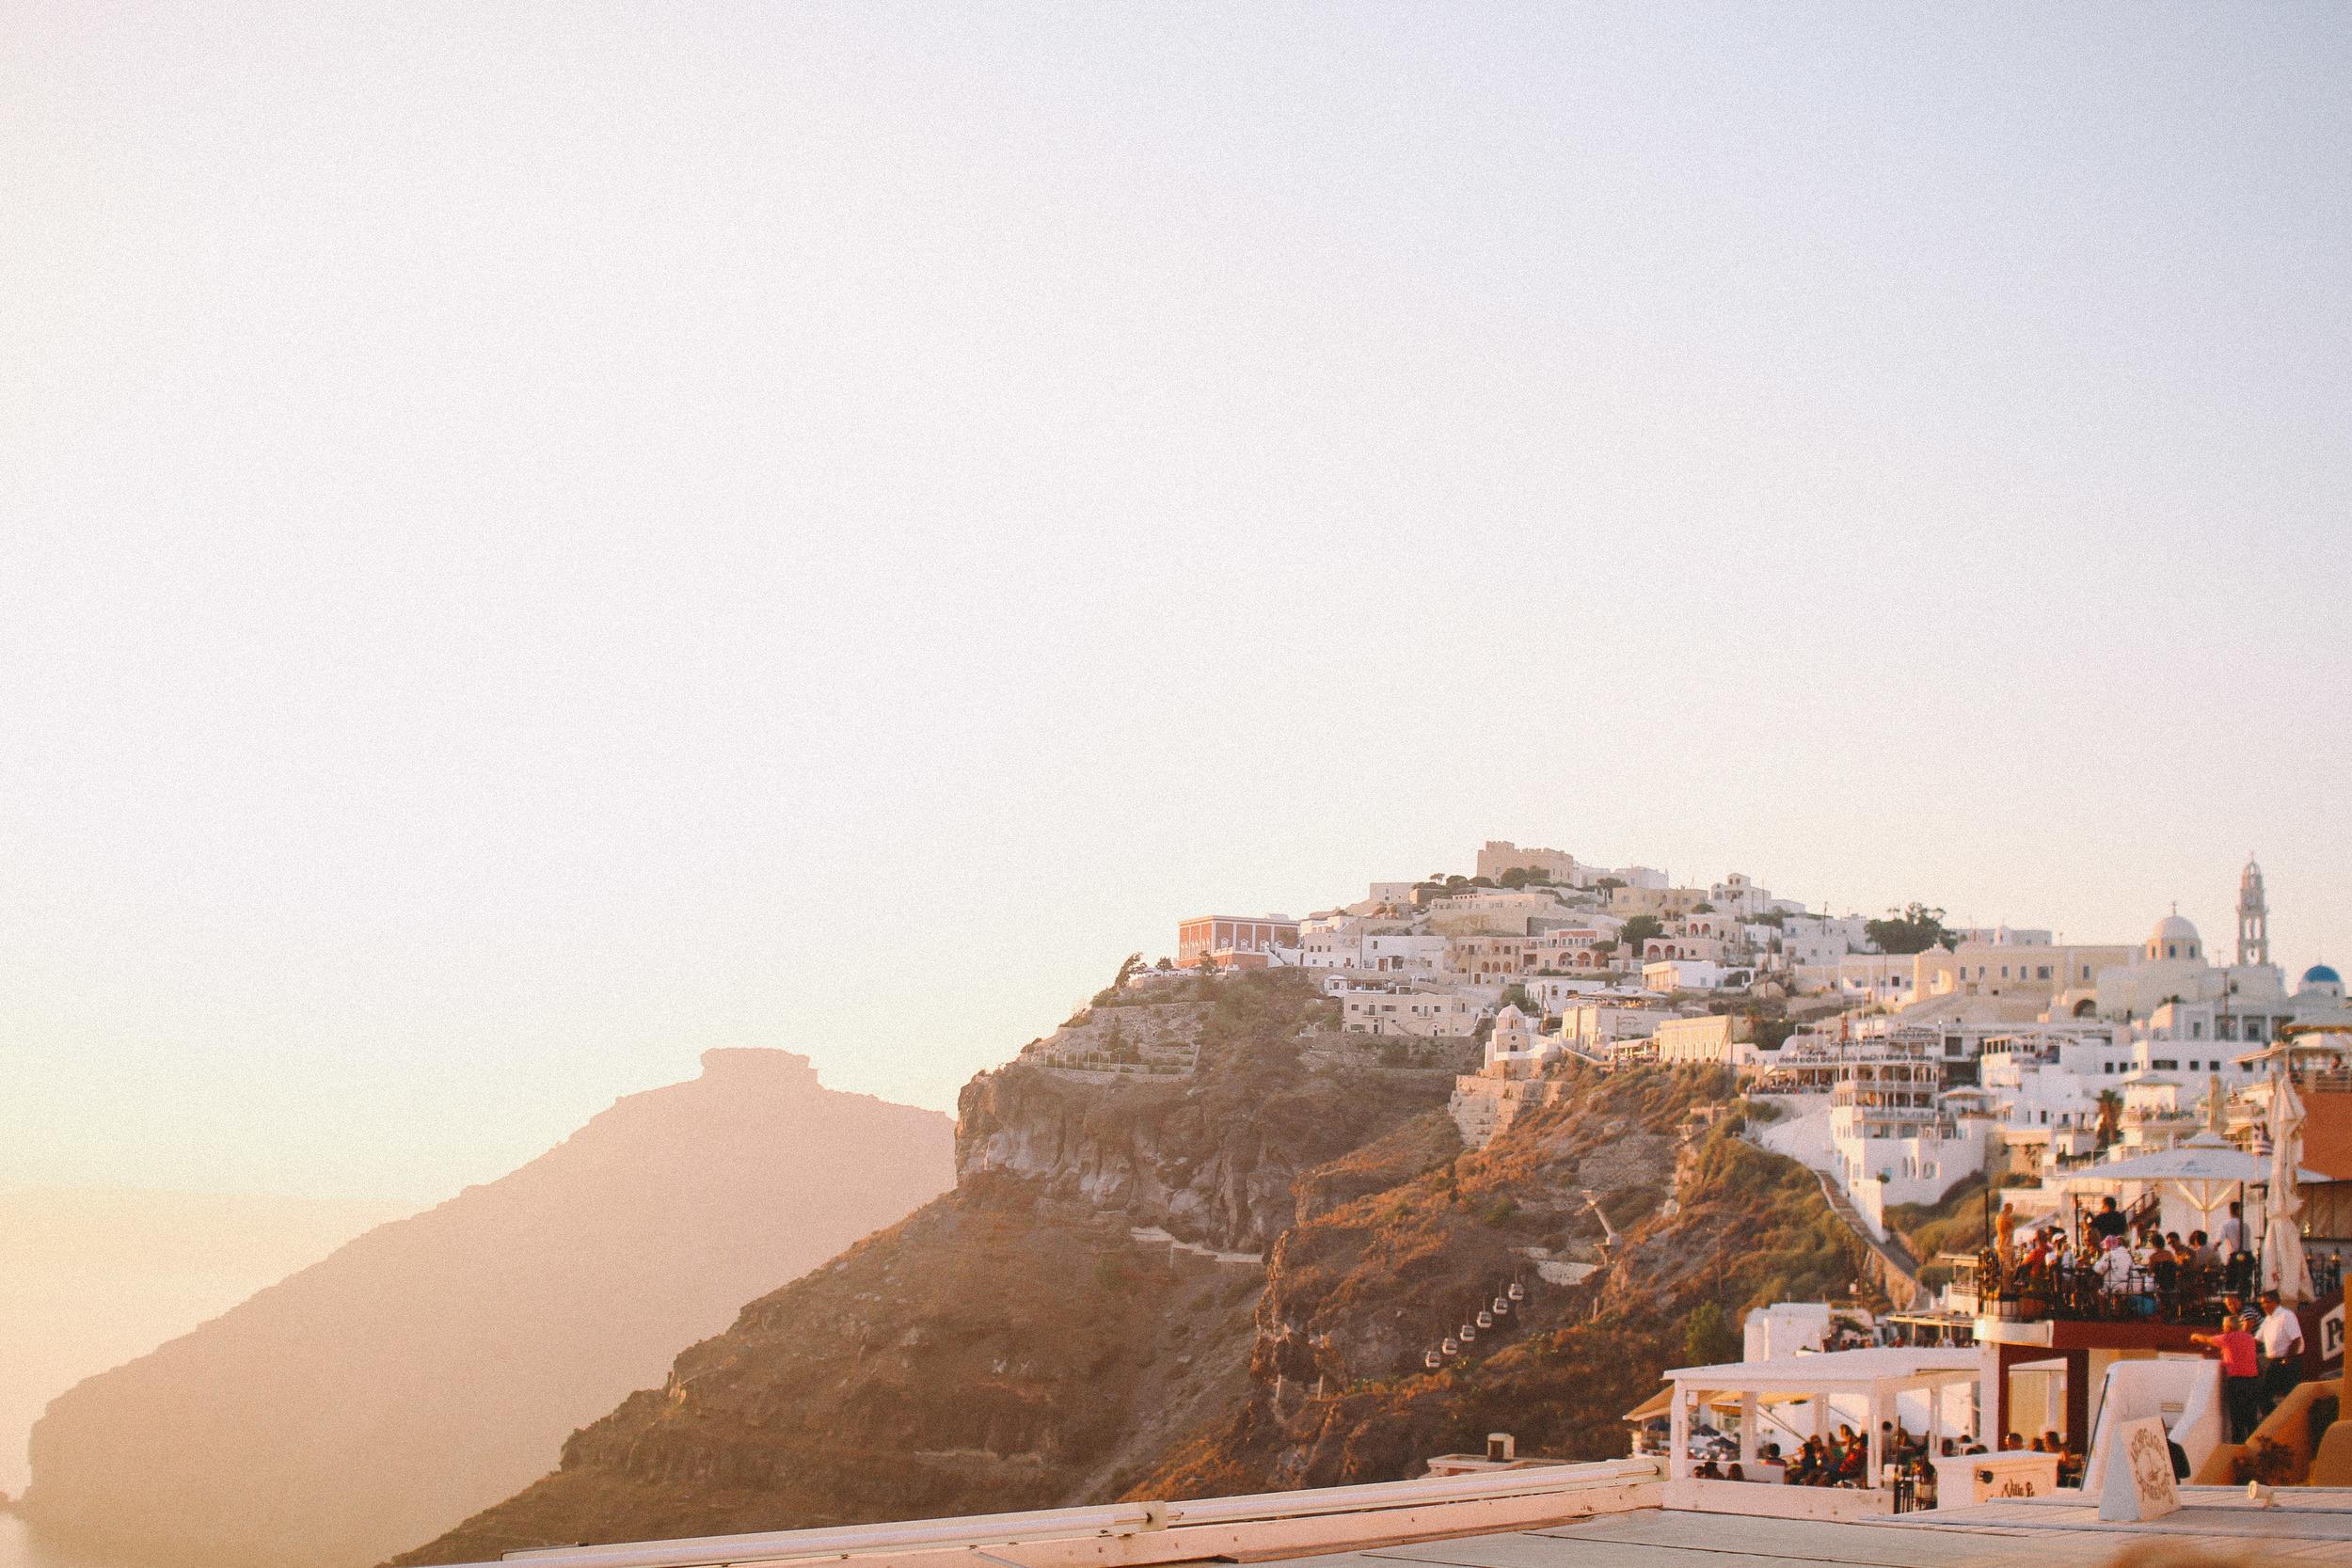 Sunset in Oia, Santorini